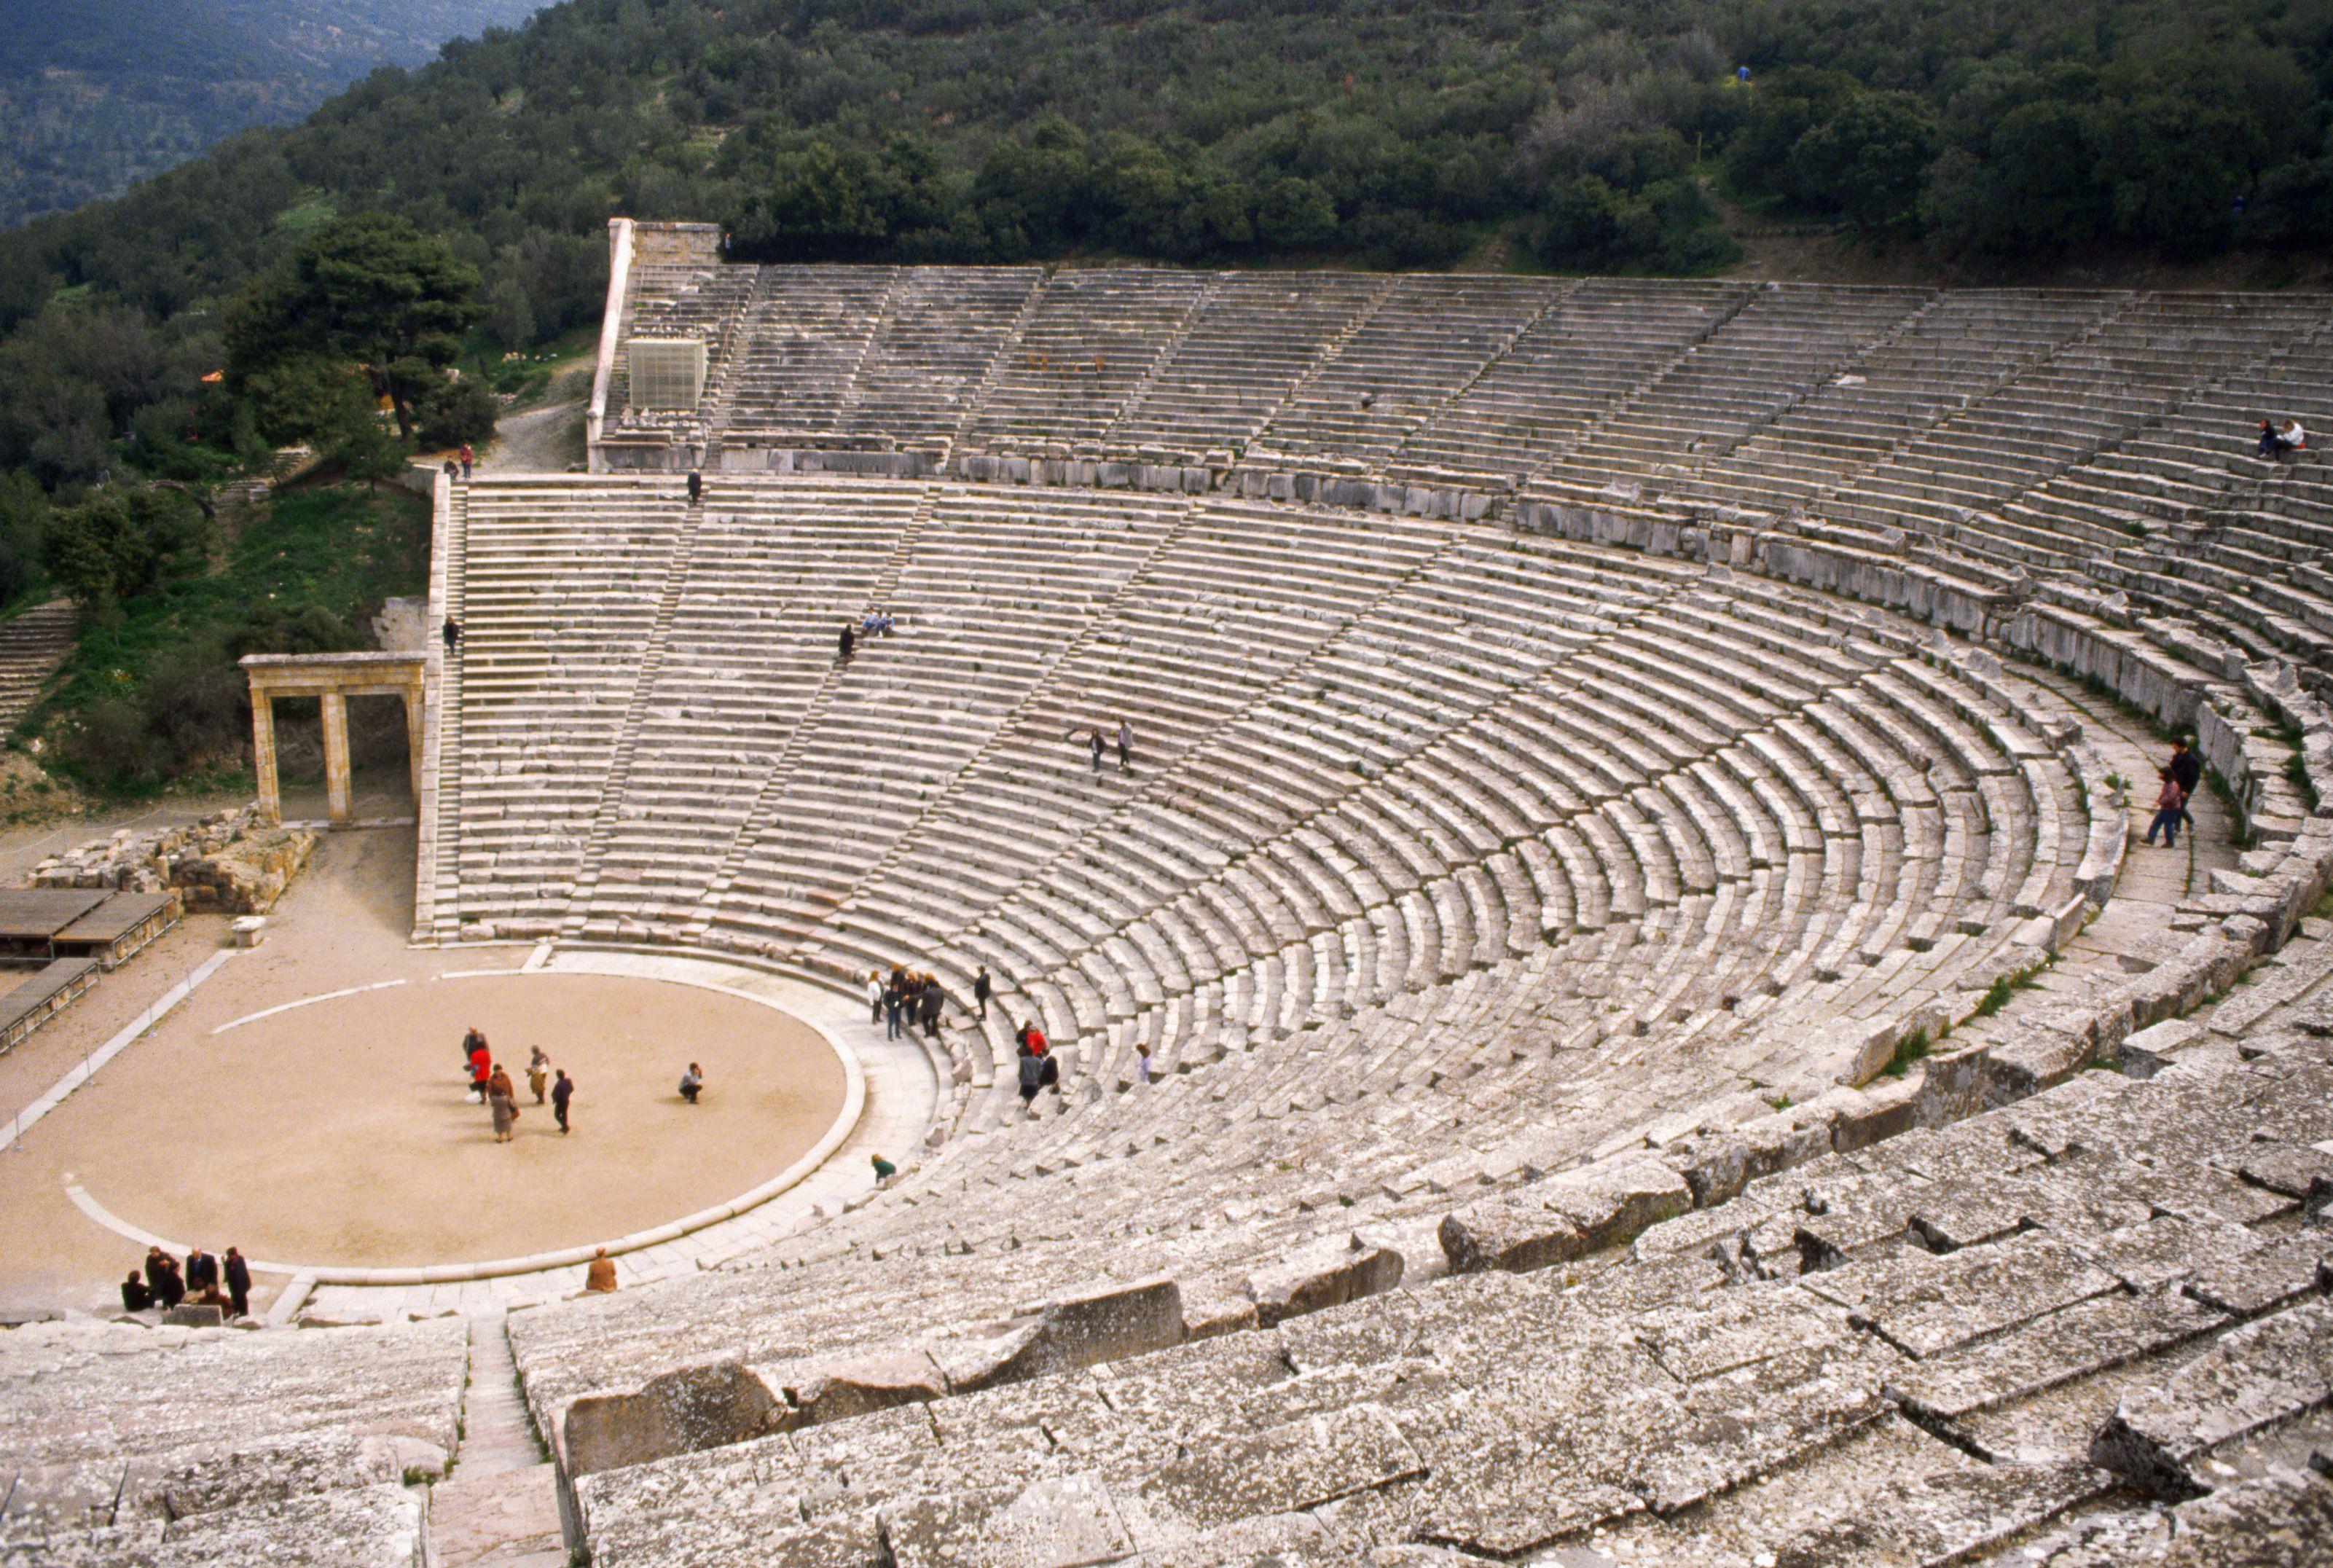 The Theater of Epidauros